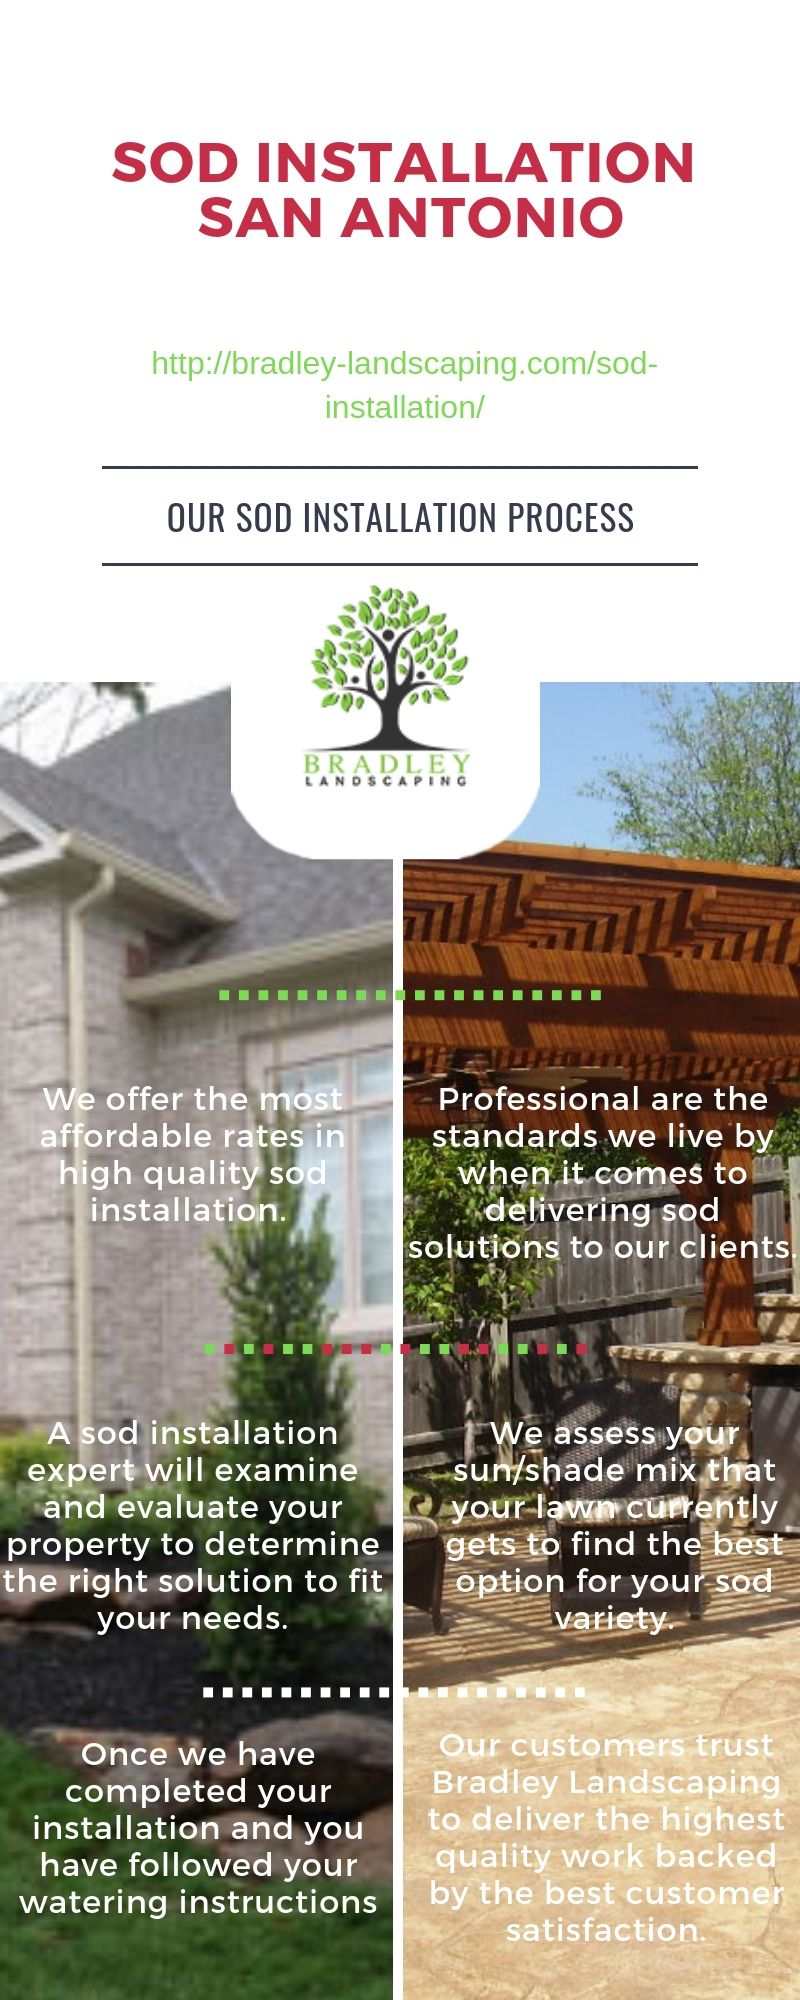 Affordable Quality Sod Installation Lawn Care San Antonio